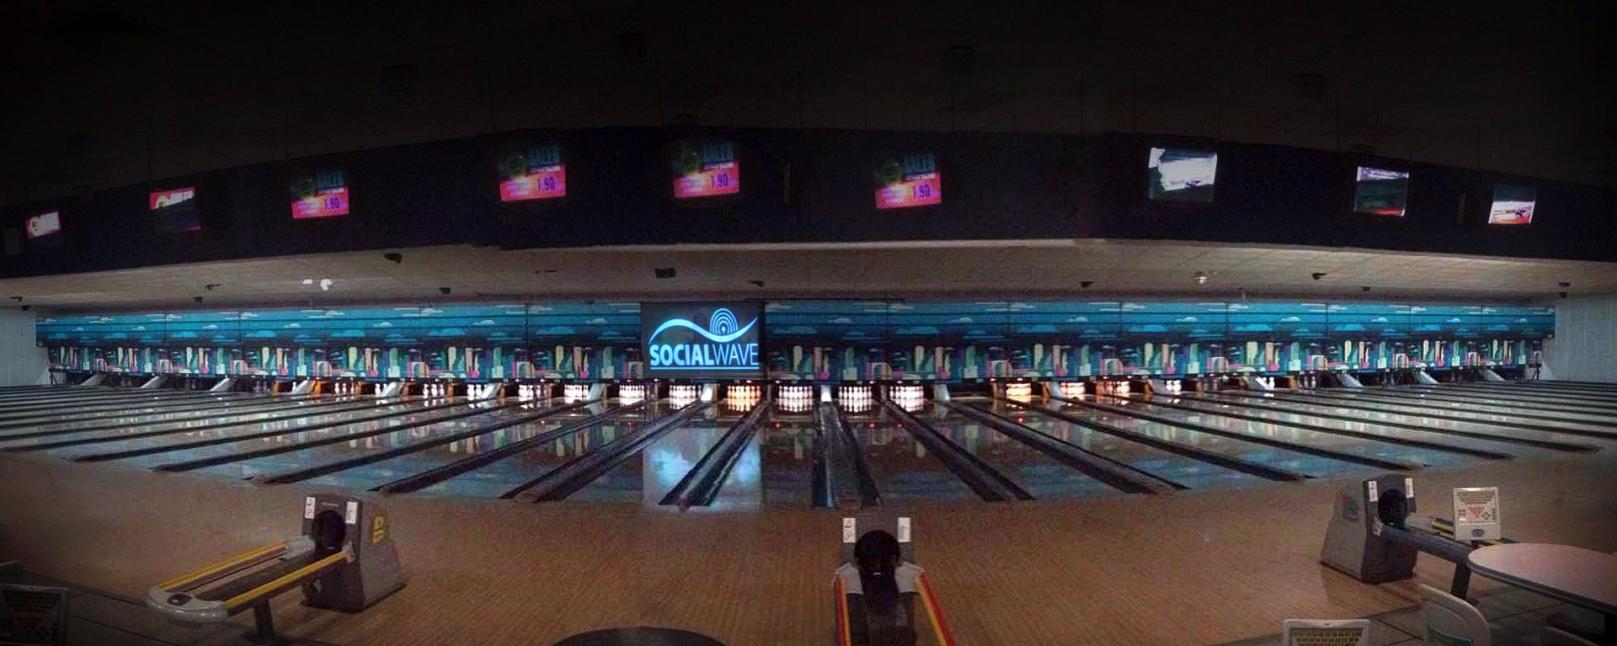 Kegelbahn Frankfurt bowling center bowling frankfurt